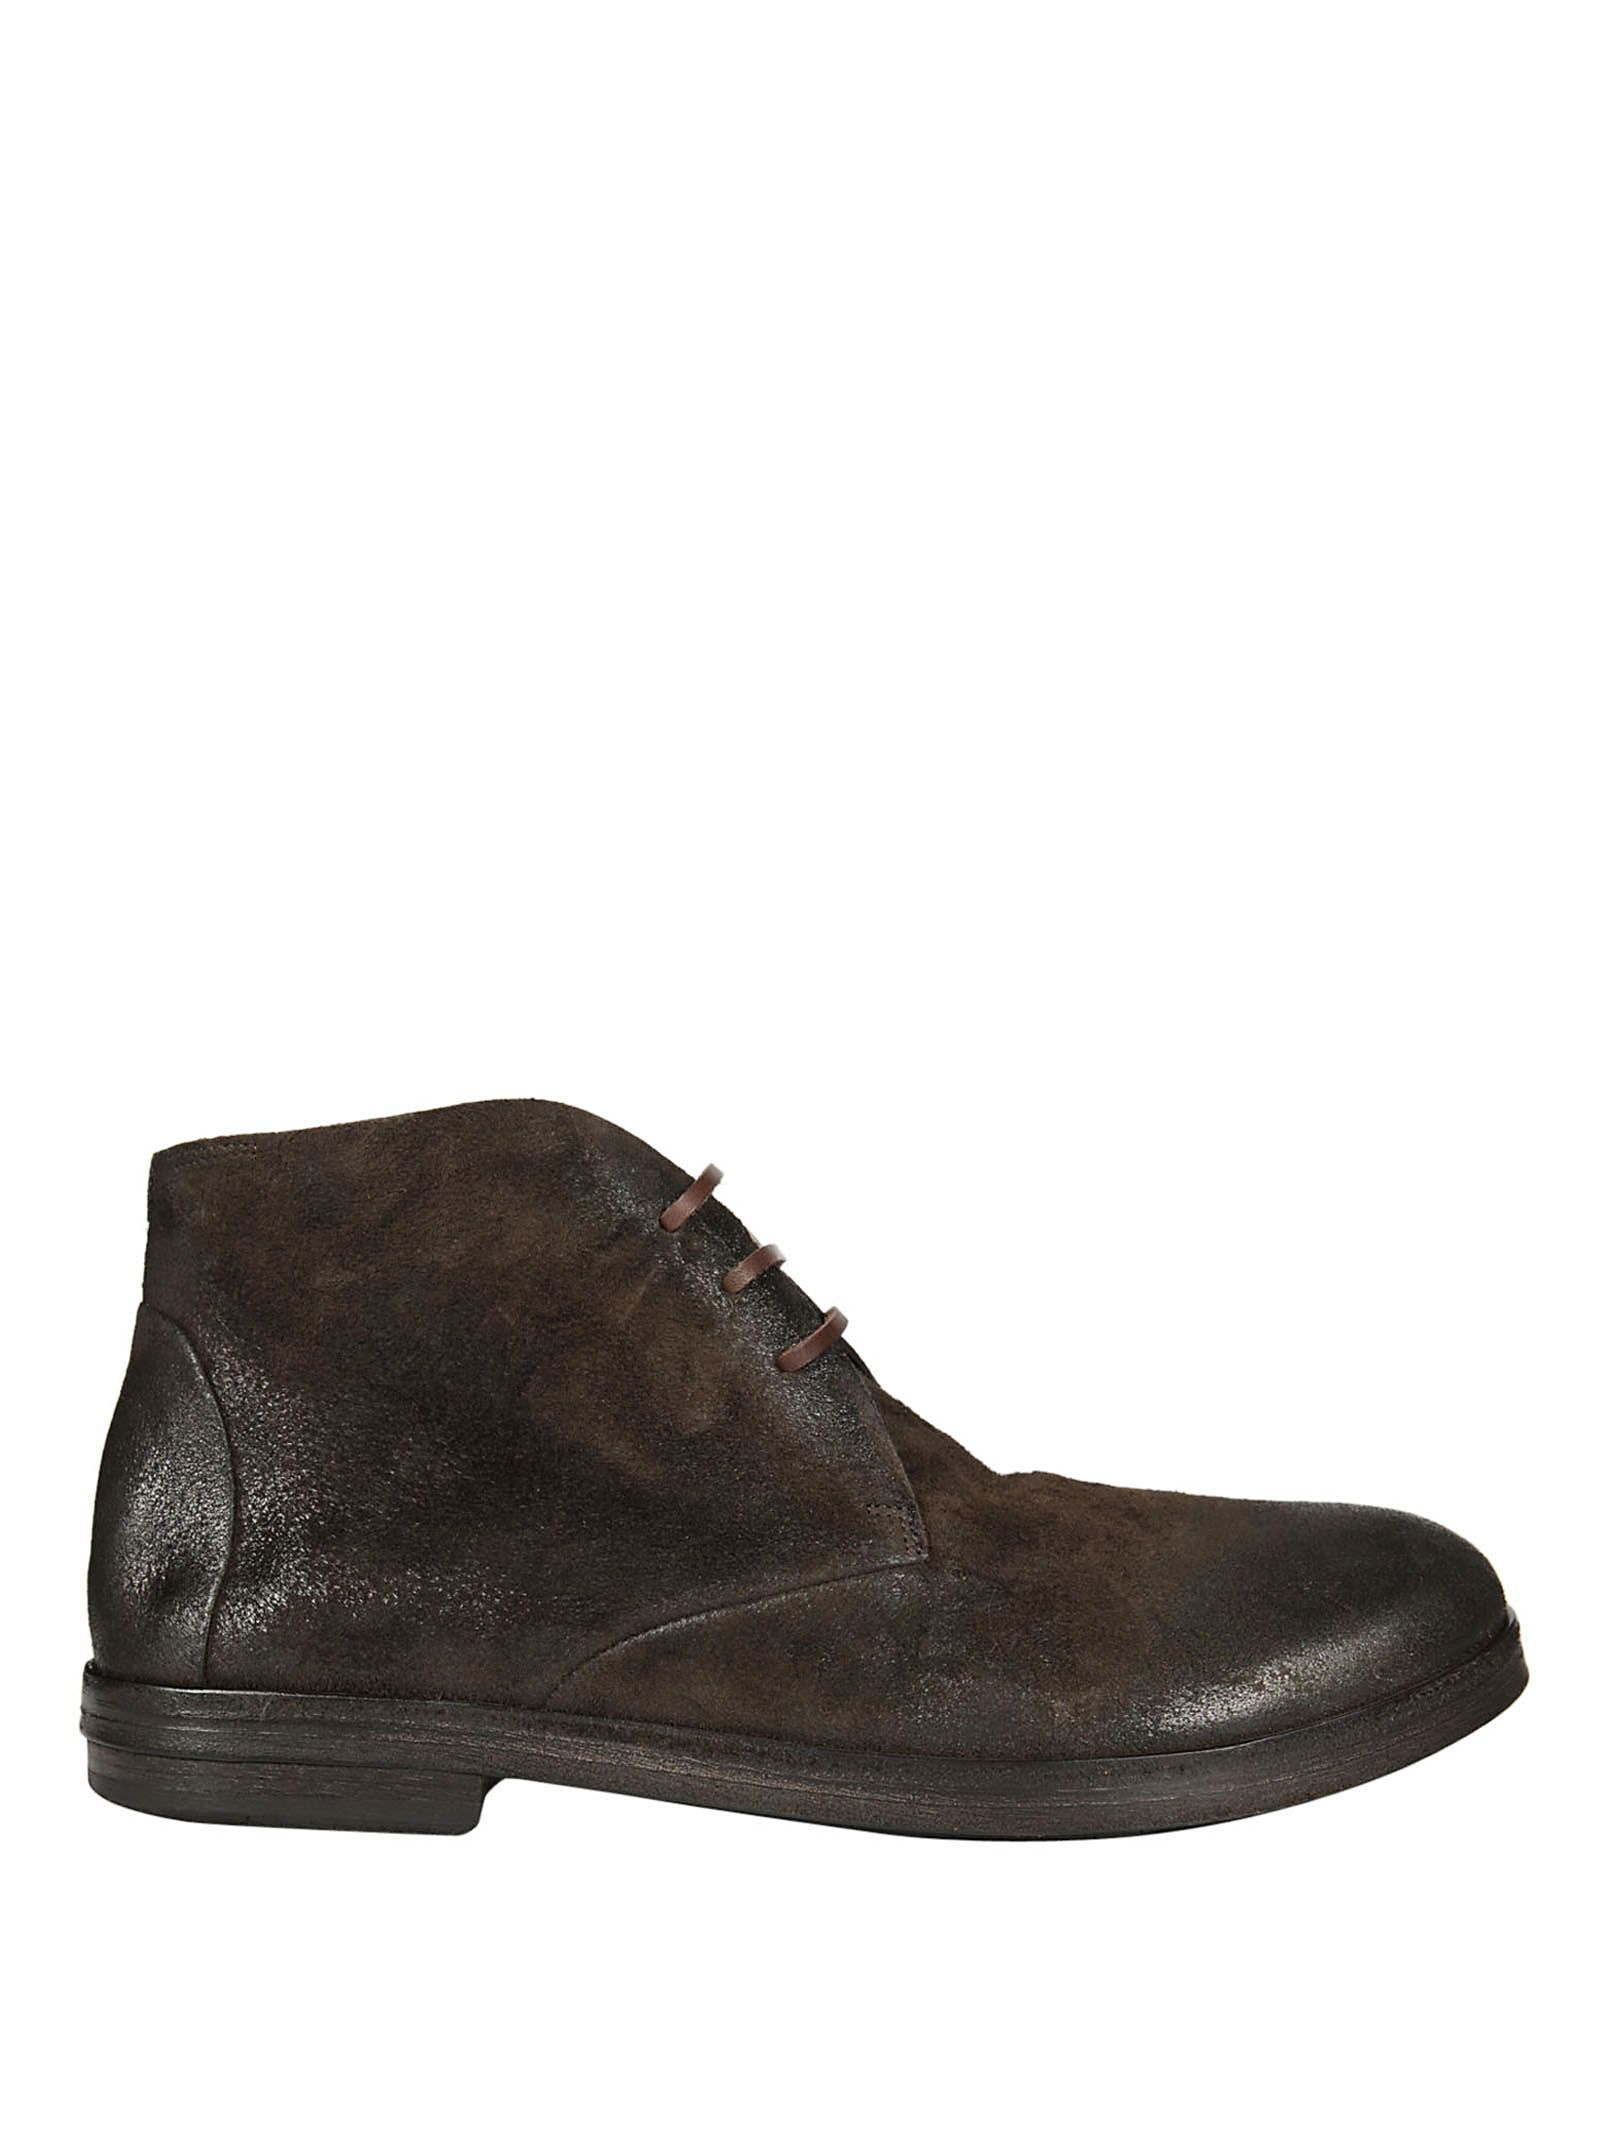 Marsall Desert Boots En Détresse - Brun 7nfMVKalXe